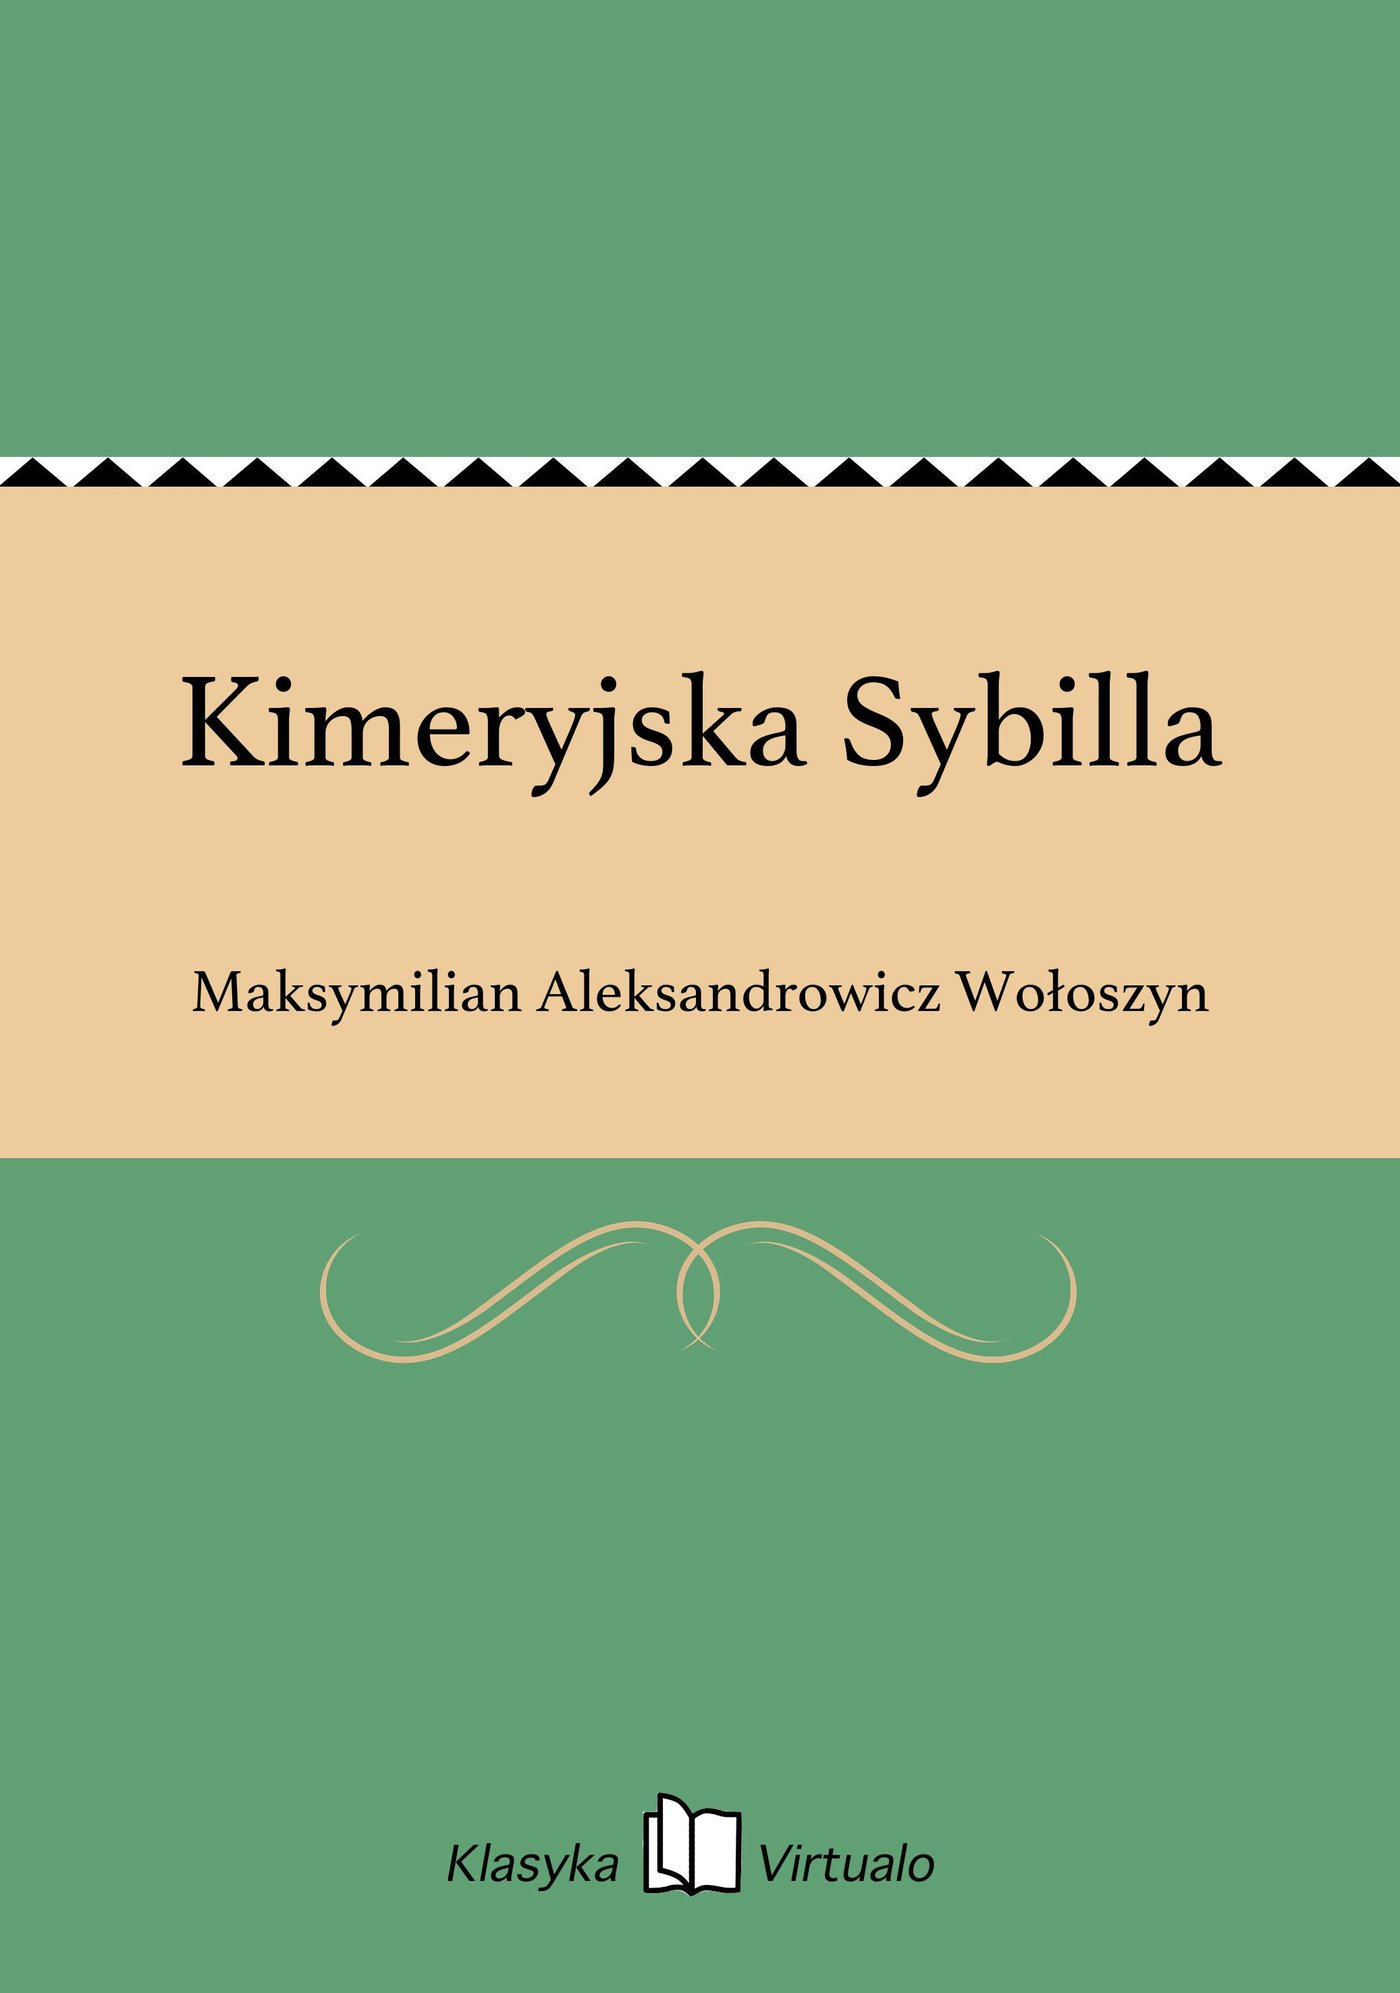 Kimeryjska Sybilla - Ebook (Książka EPUB) do pobrania w formacie EPUB